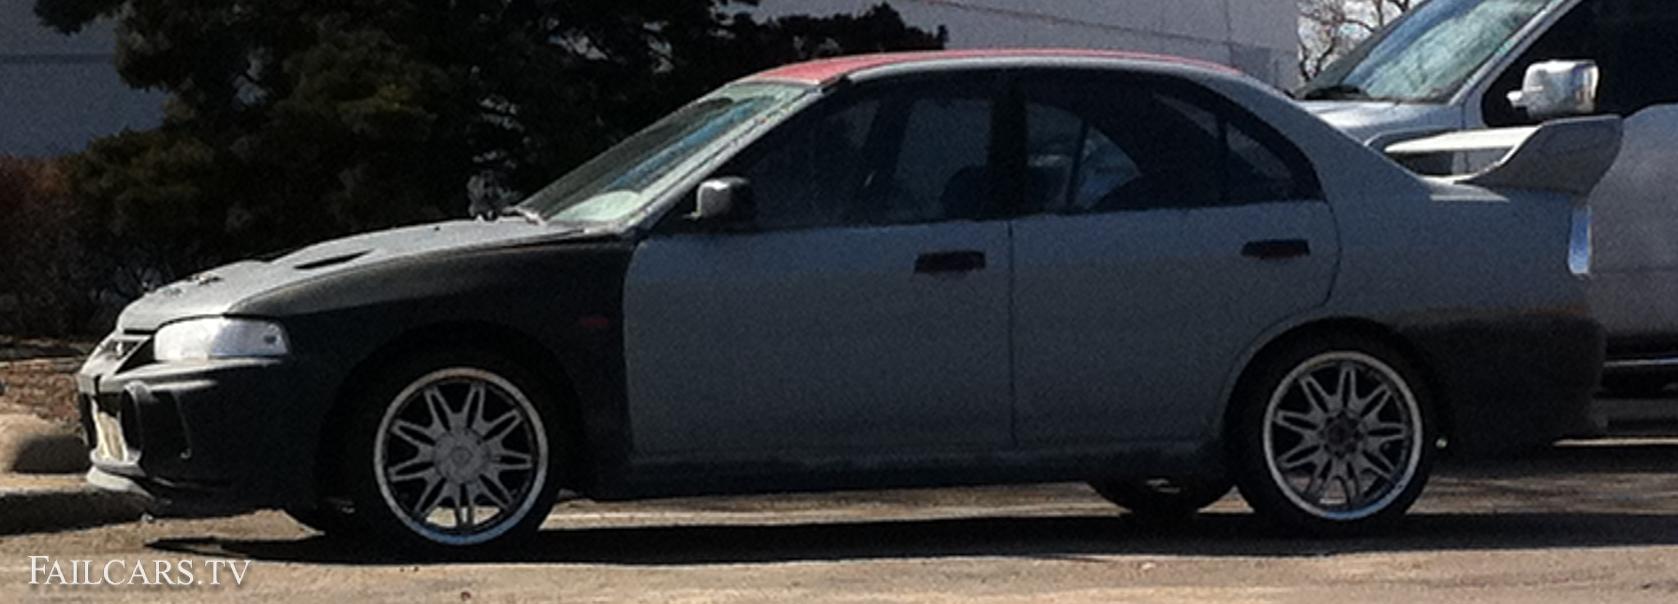 Primer Nissan Sentra Fail Car